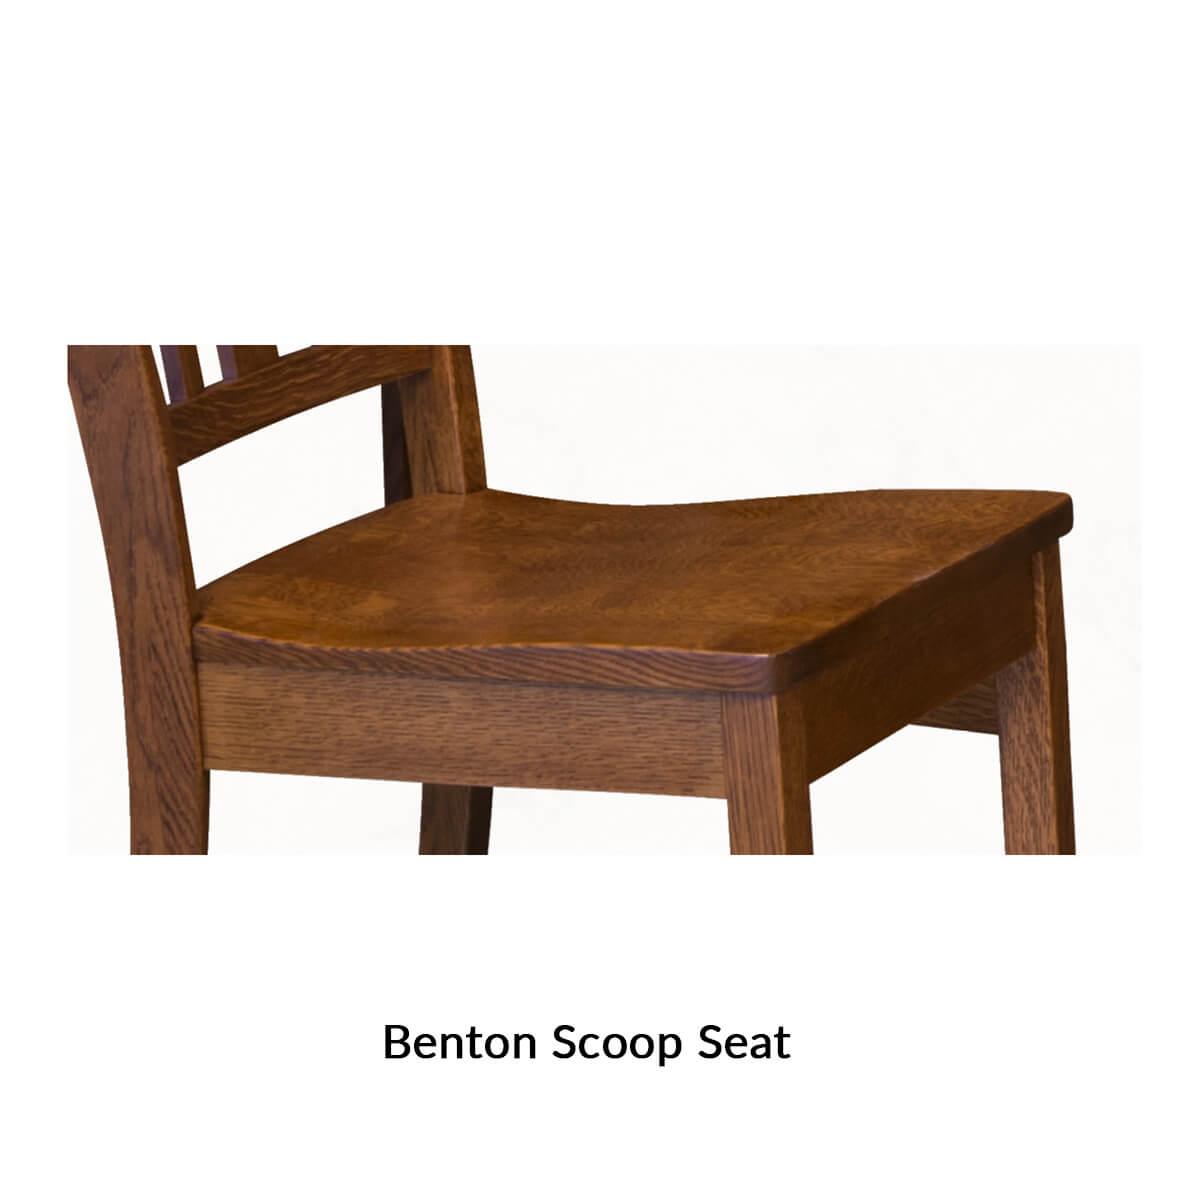 1-benton-scoop-seat-mission-edge-.jpg